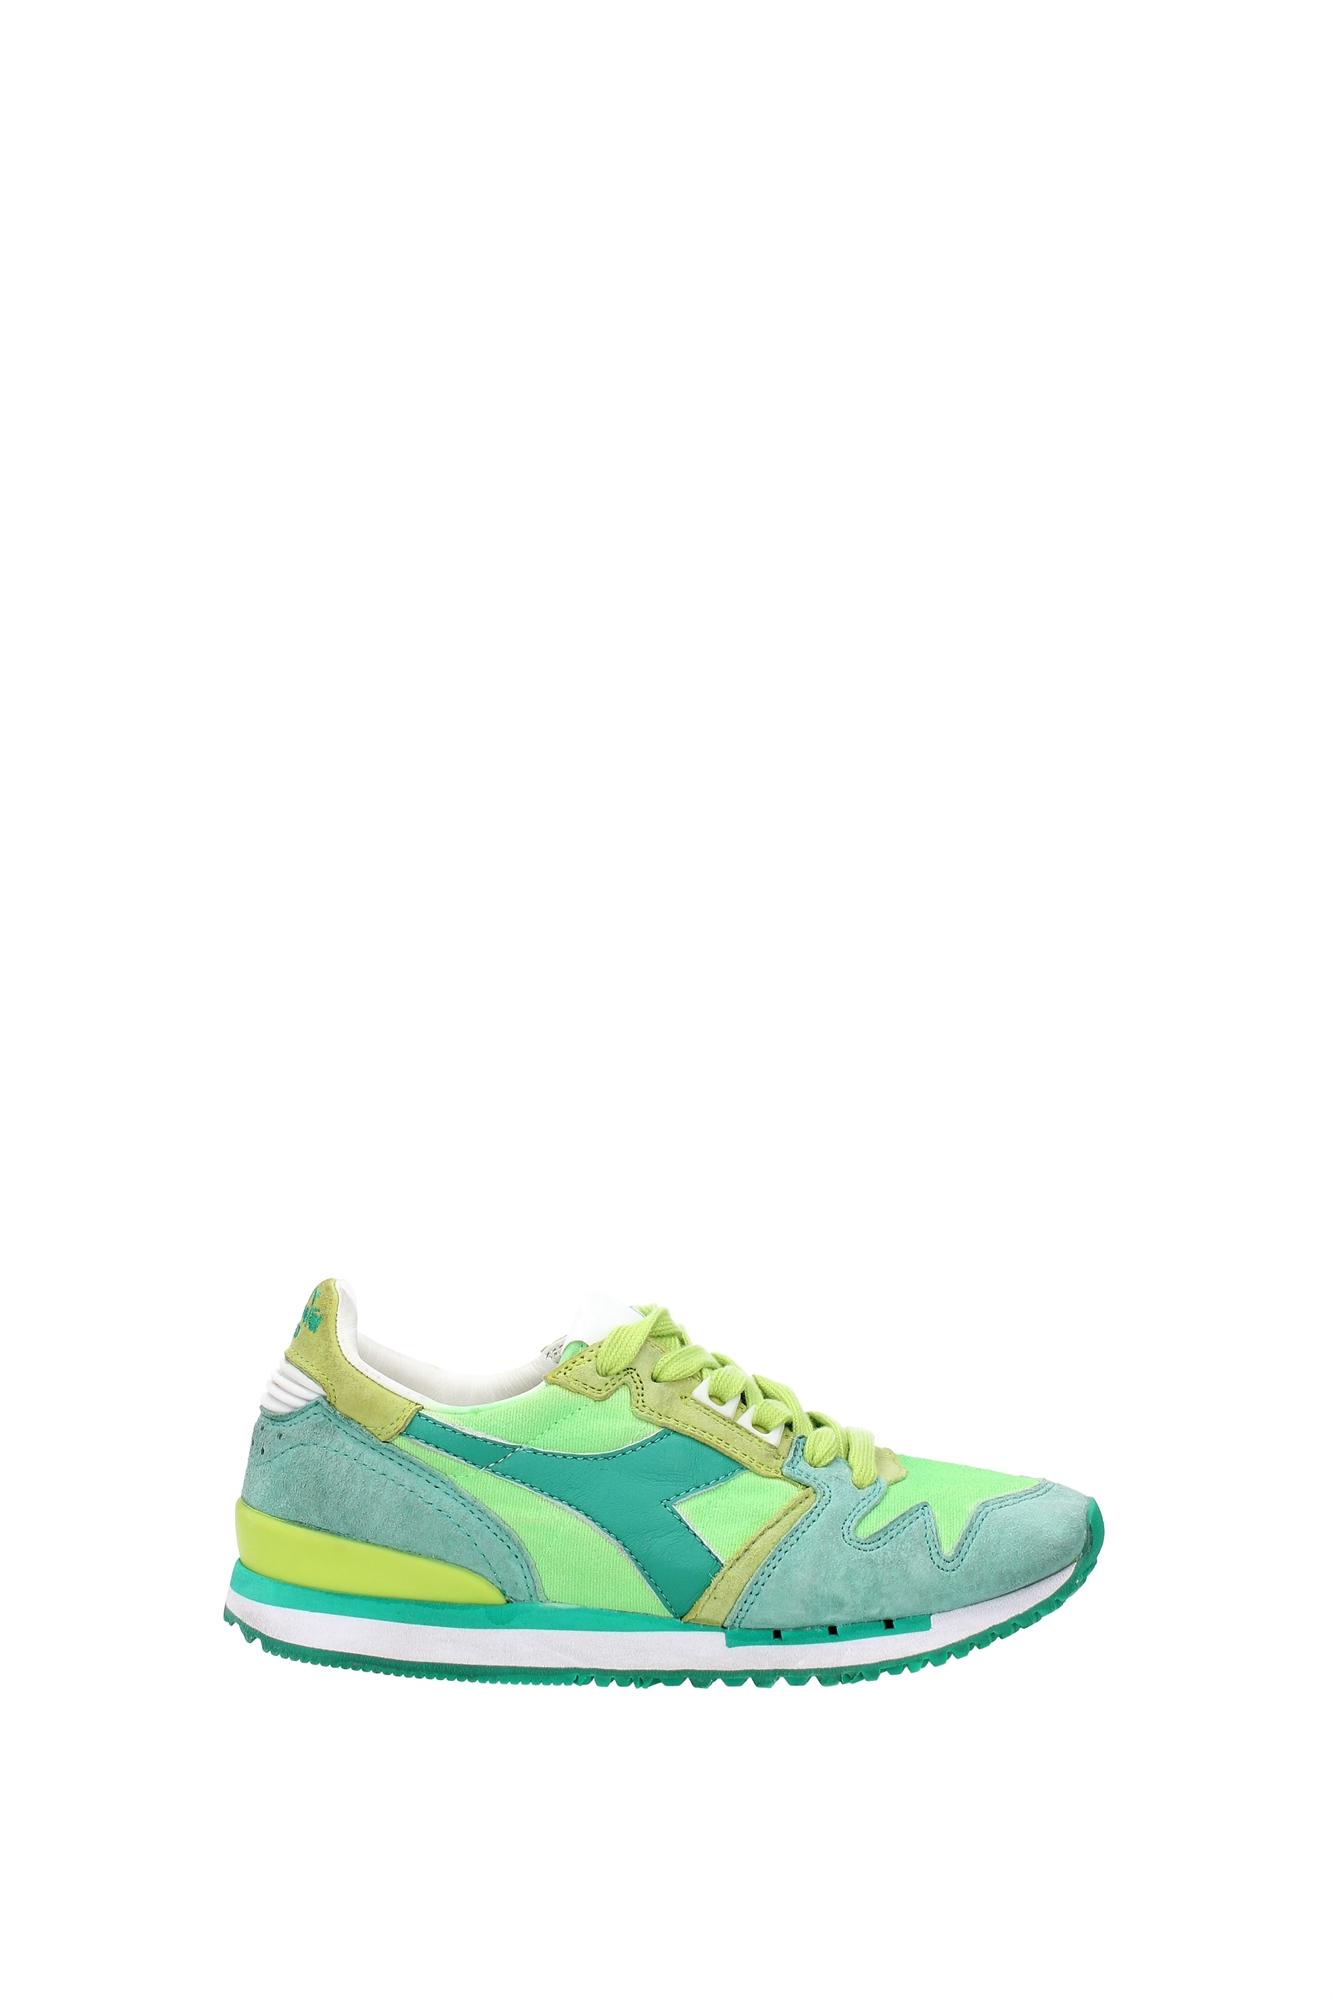 Sneakers Diadora Heritage Damenschuhe Damenschuhe Damenschuhe - Tessuto (2011706100170279) 8252b0